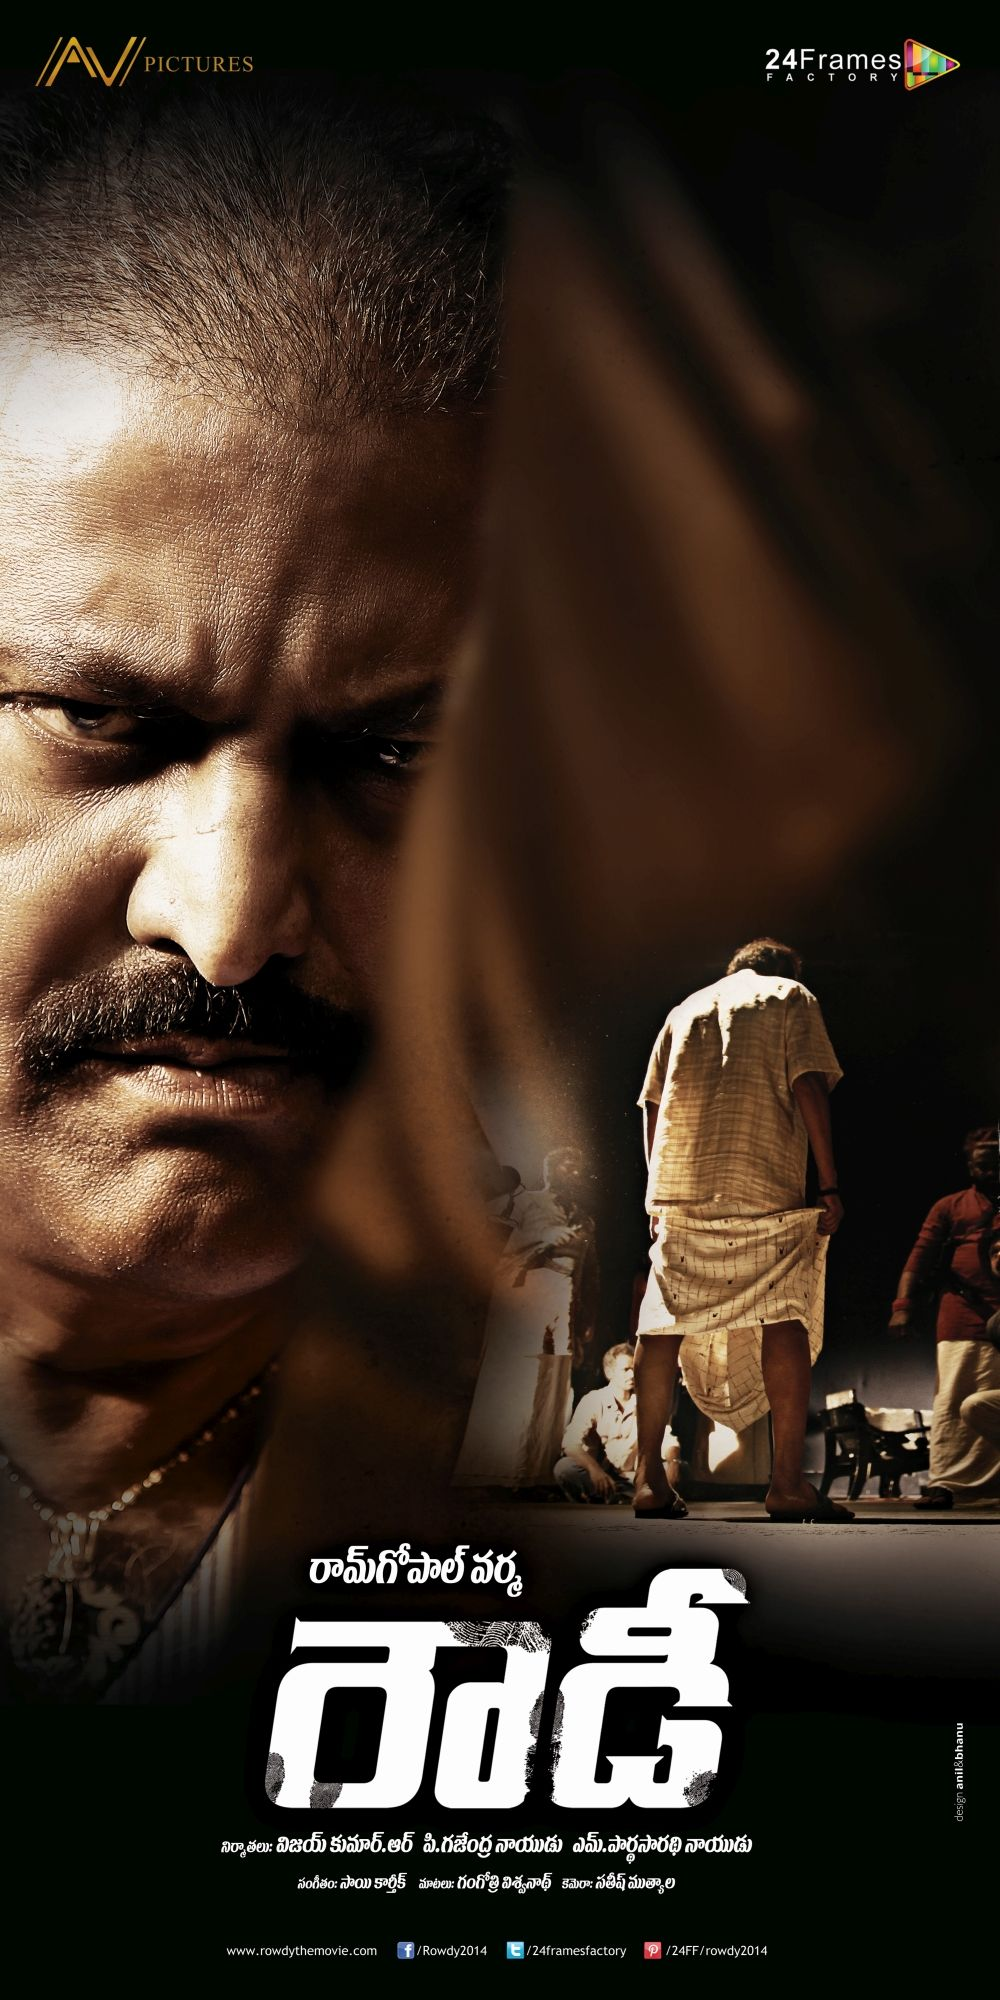 Ram Gopal Varmas Murder Trailer Out: Film seeks to give